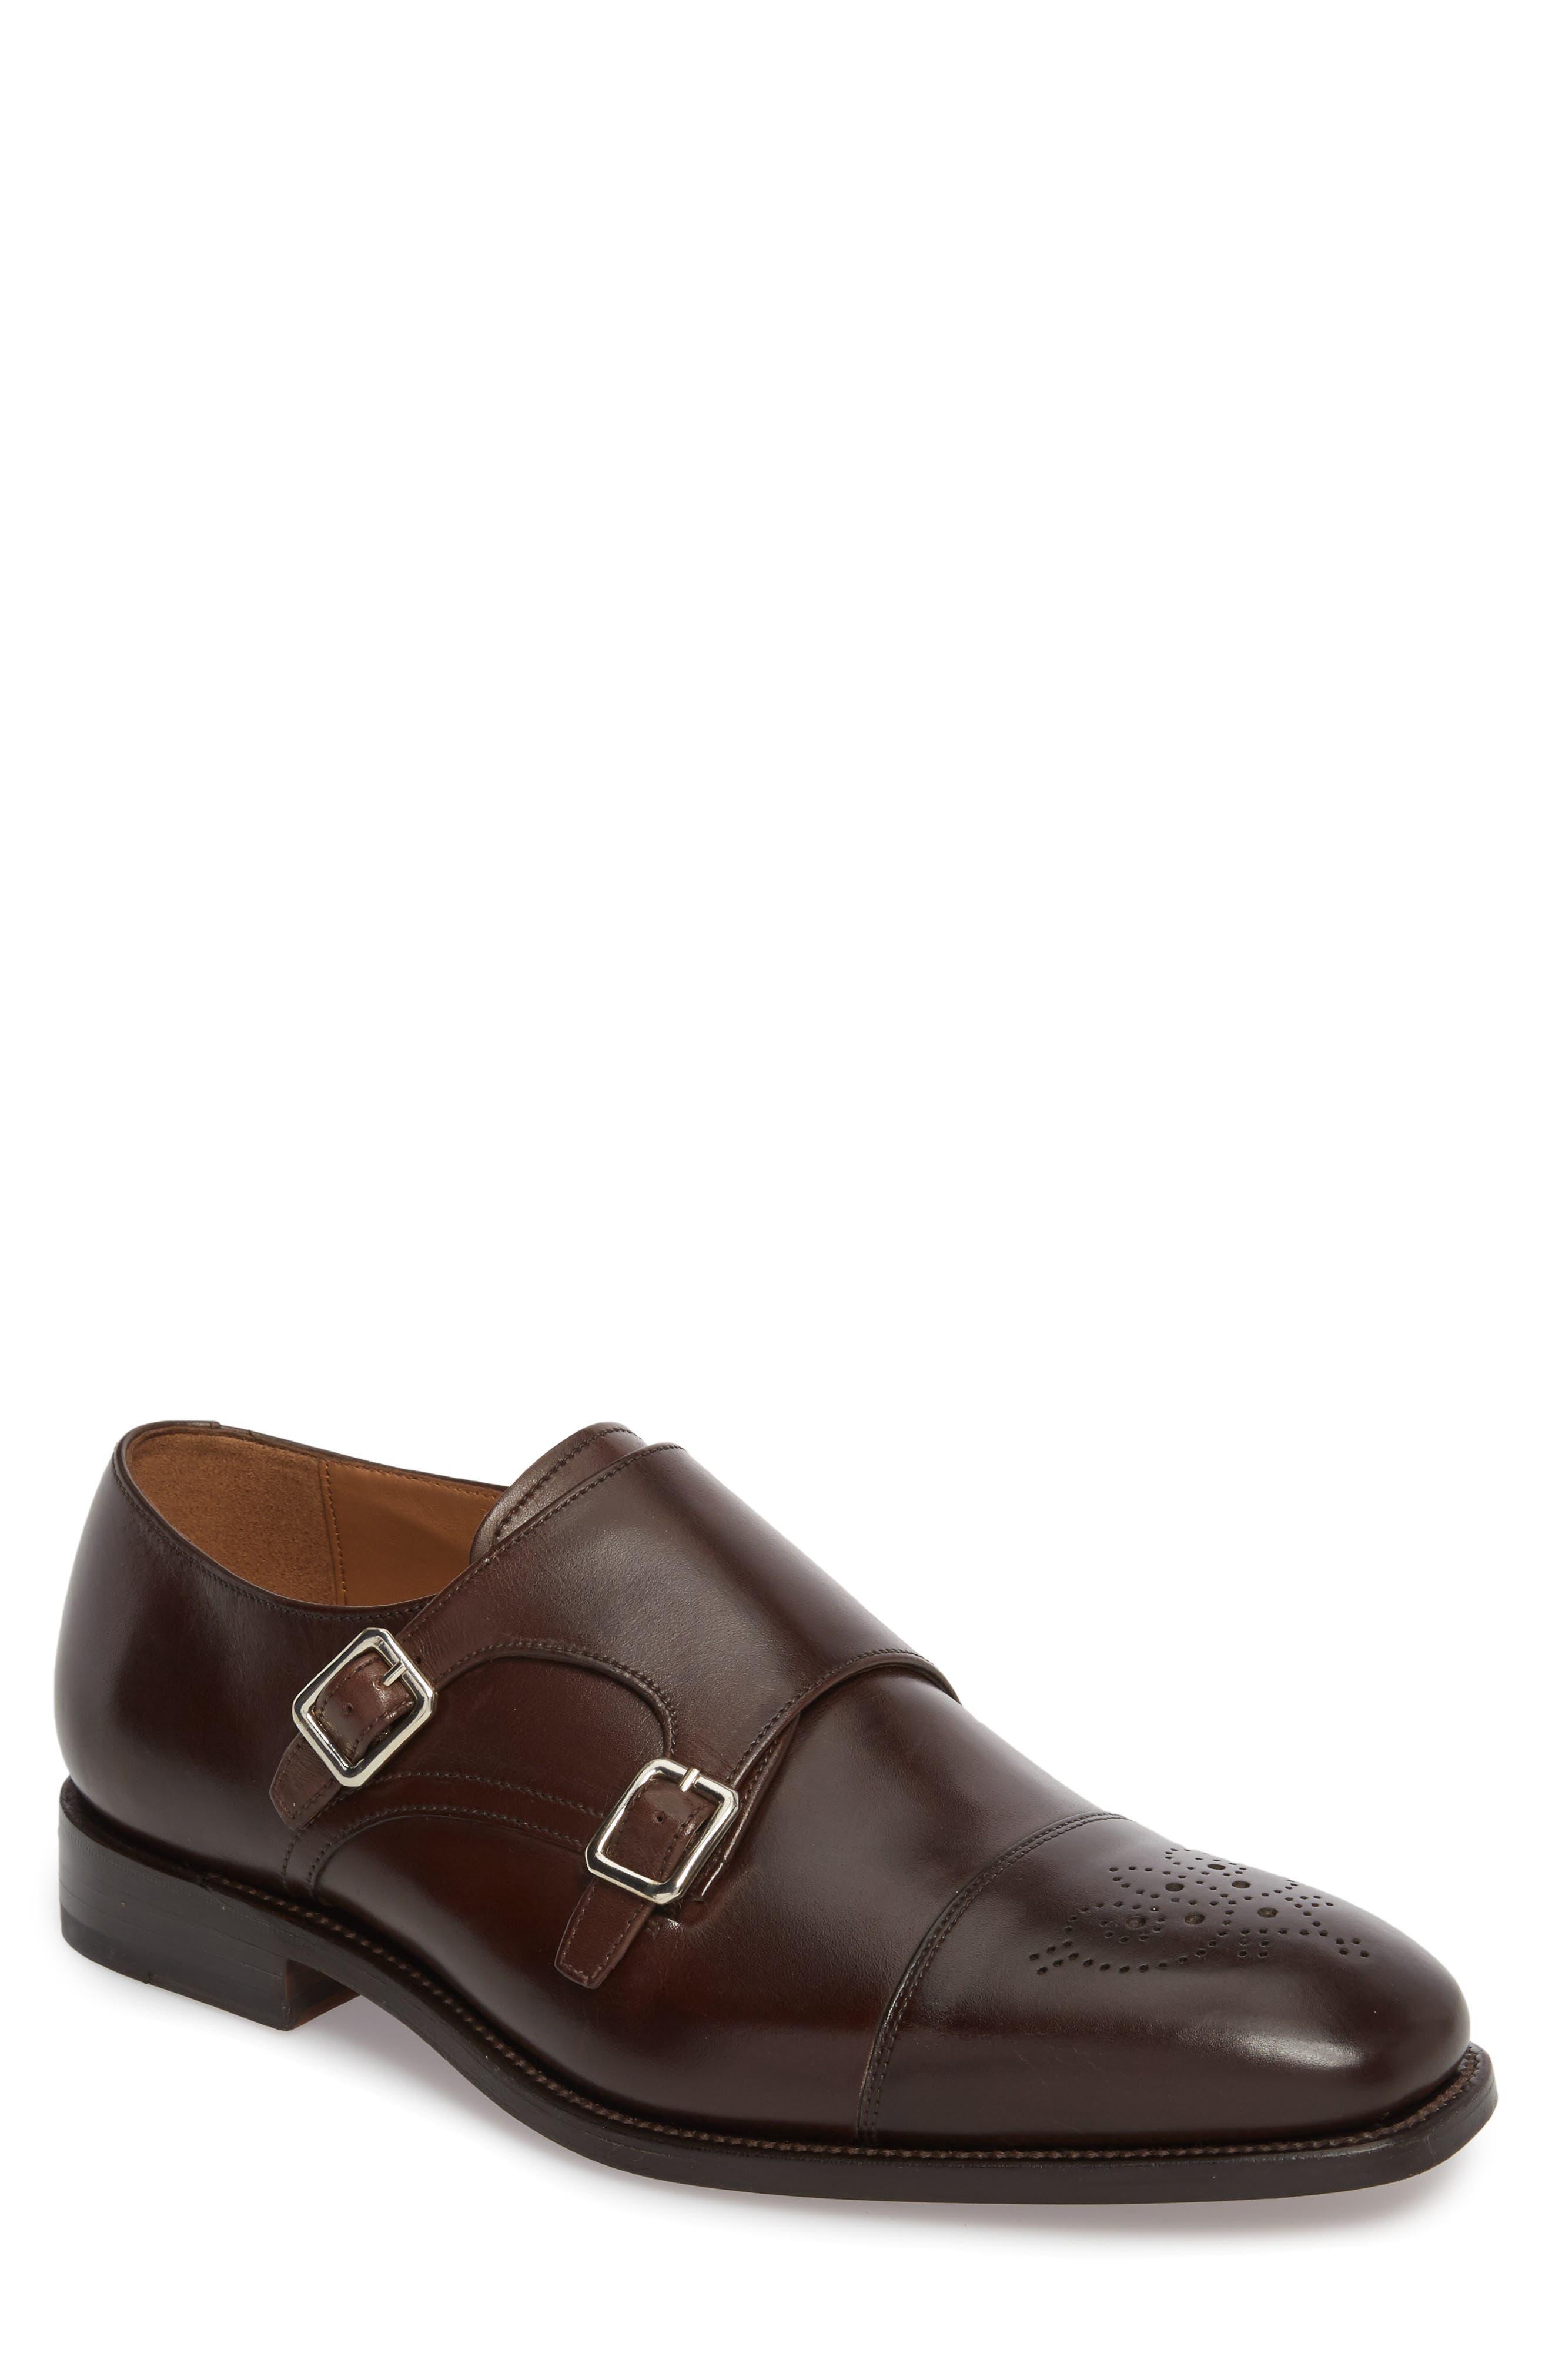 Sausalito Double Monk Strap Shoe,                             Main thumbnail 1, color,                             COFFEE